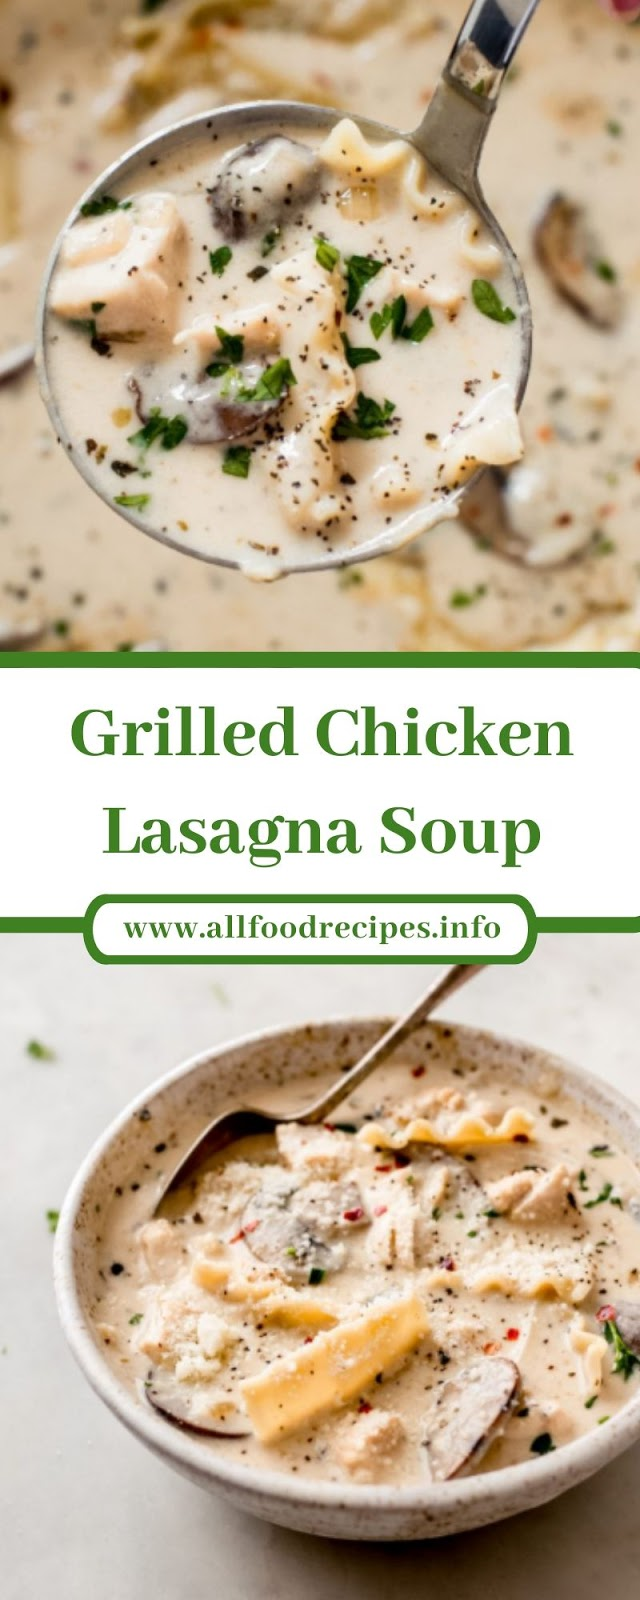 Grilled Chicken Lasagna Soup